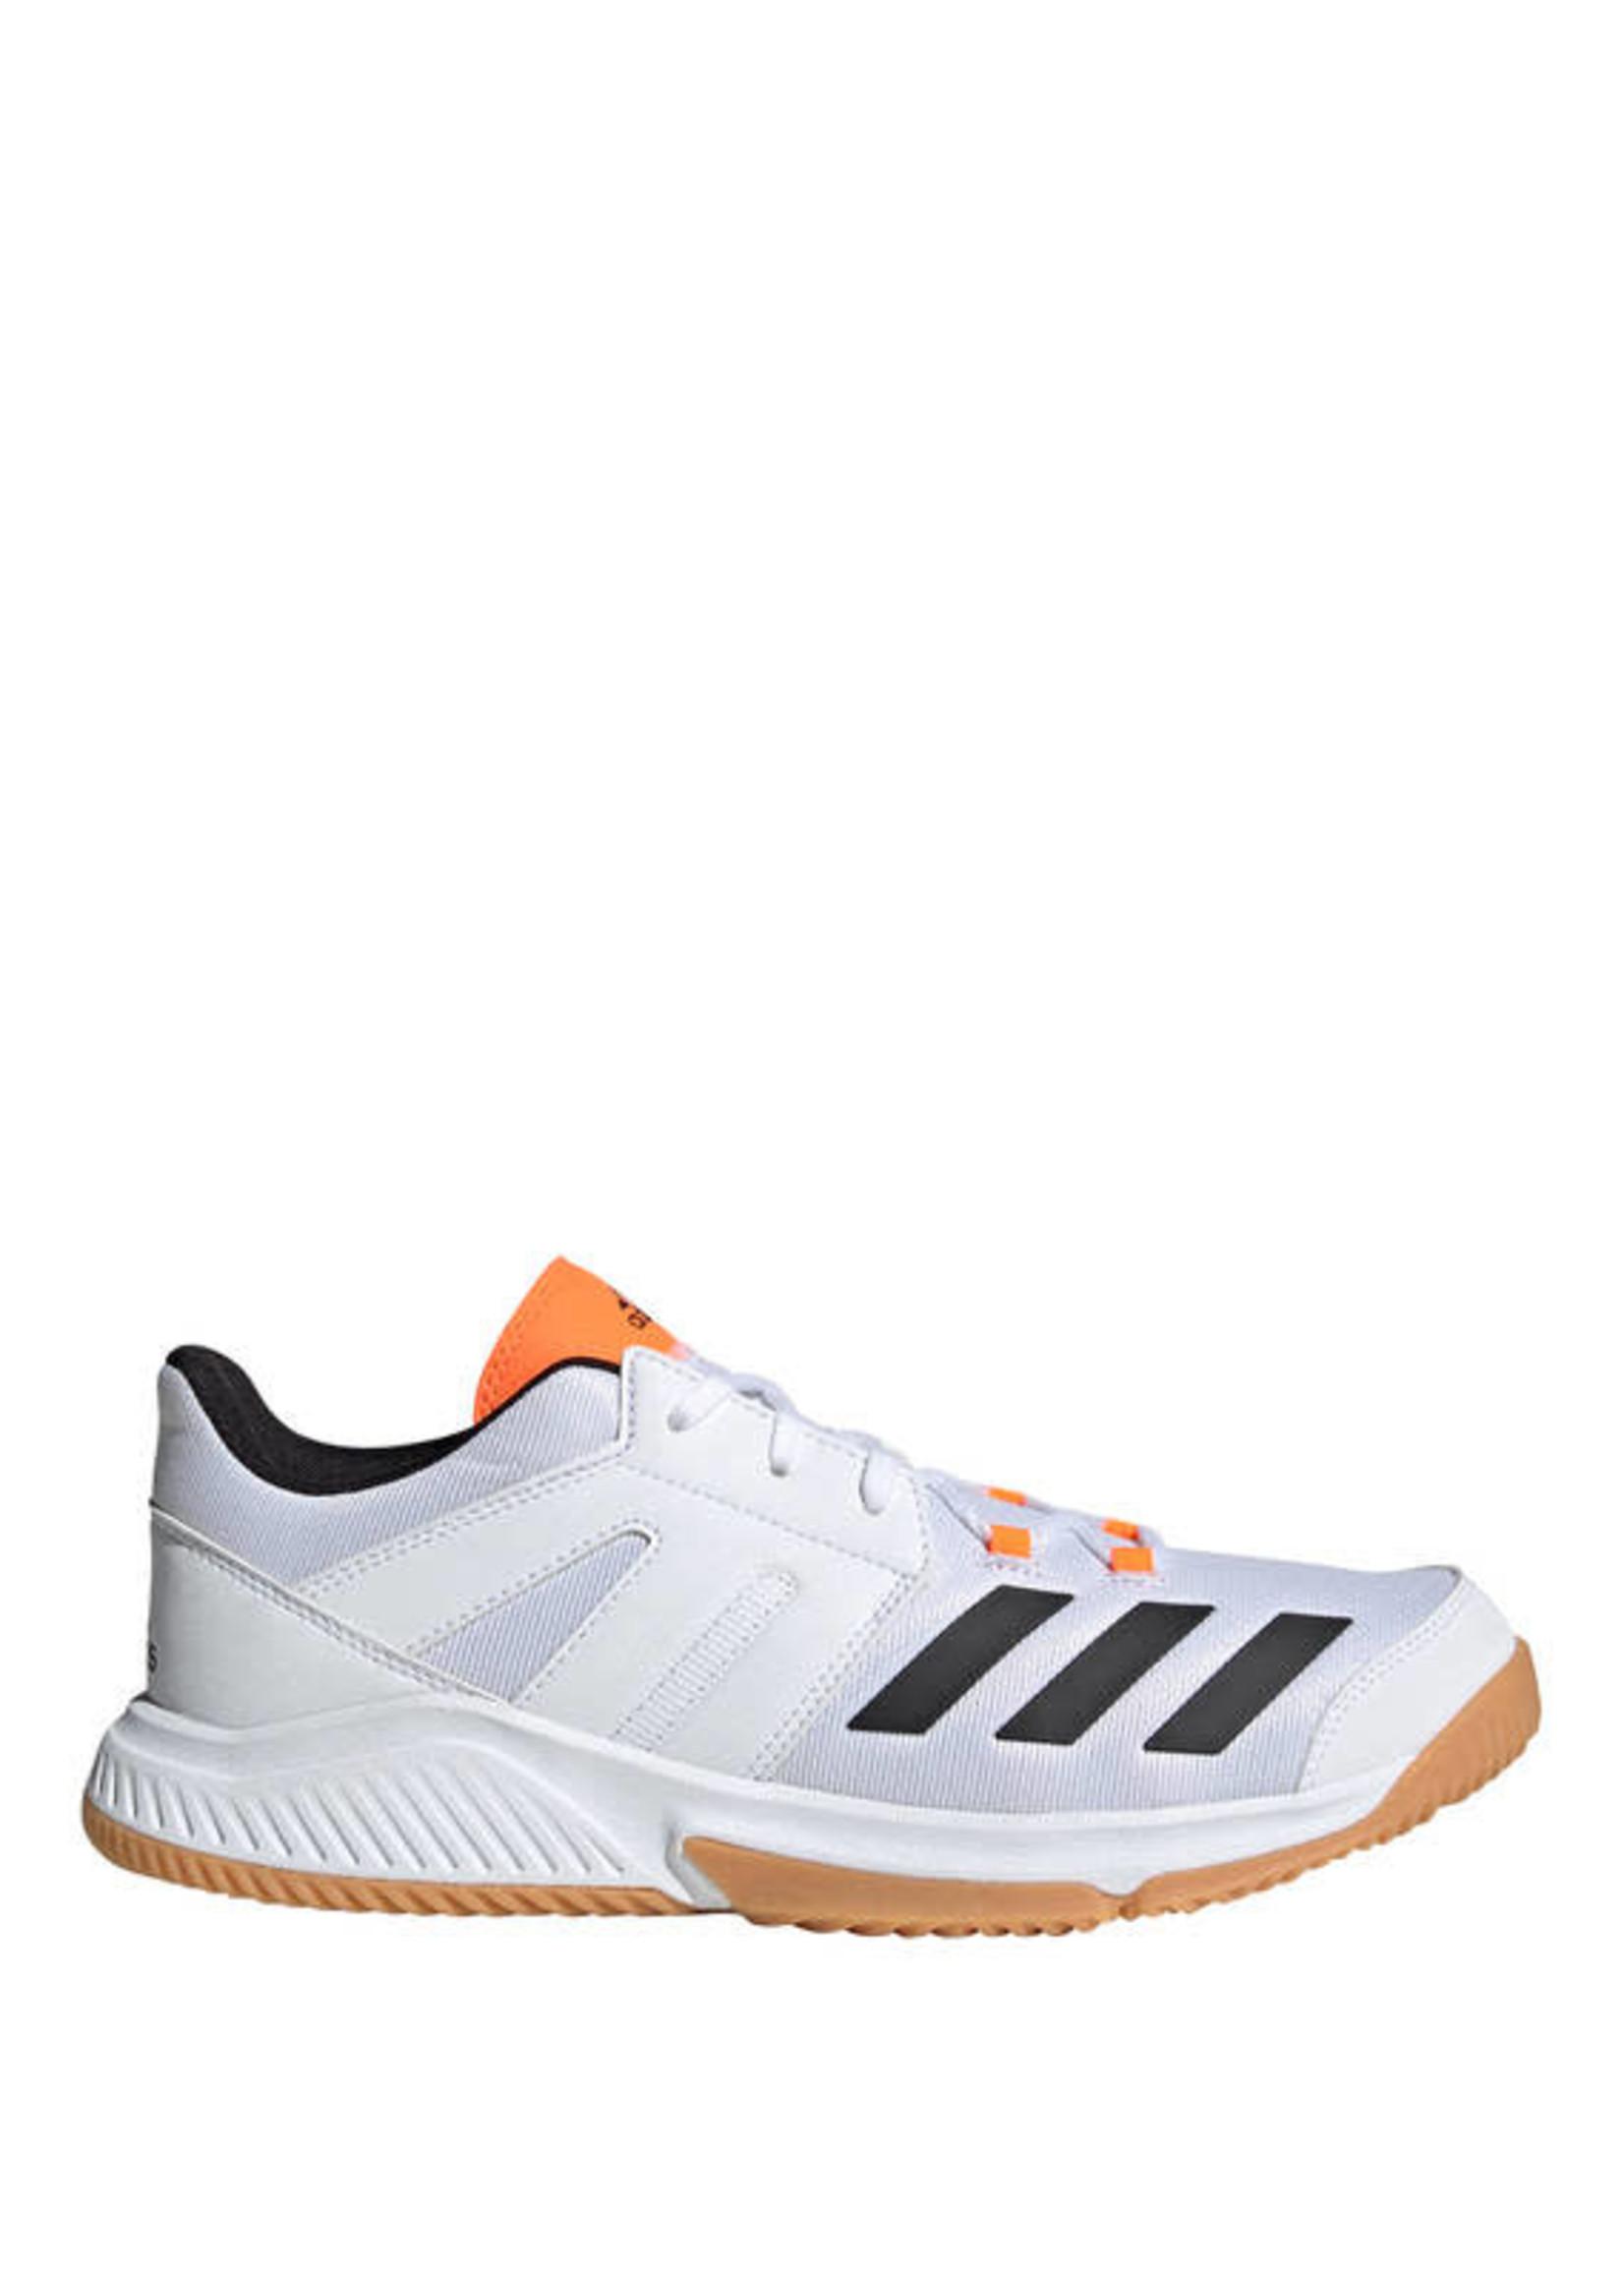 Adidas Adidas Essence Indoor Shoes (2019)